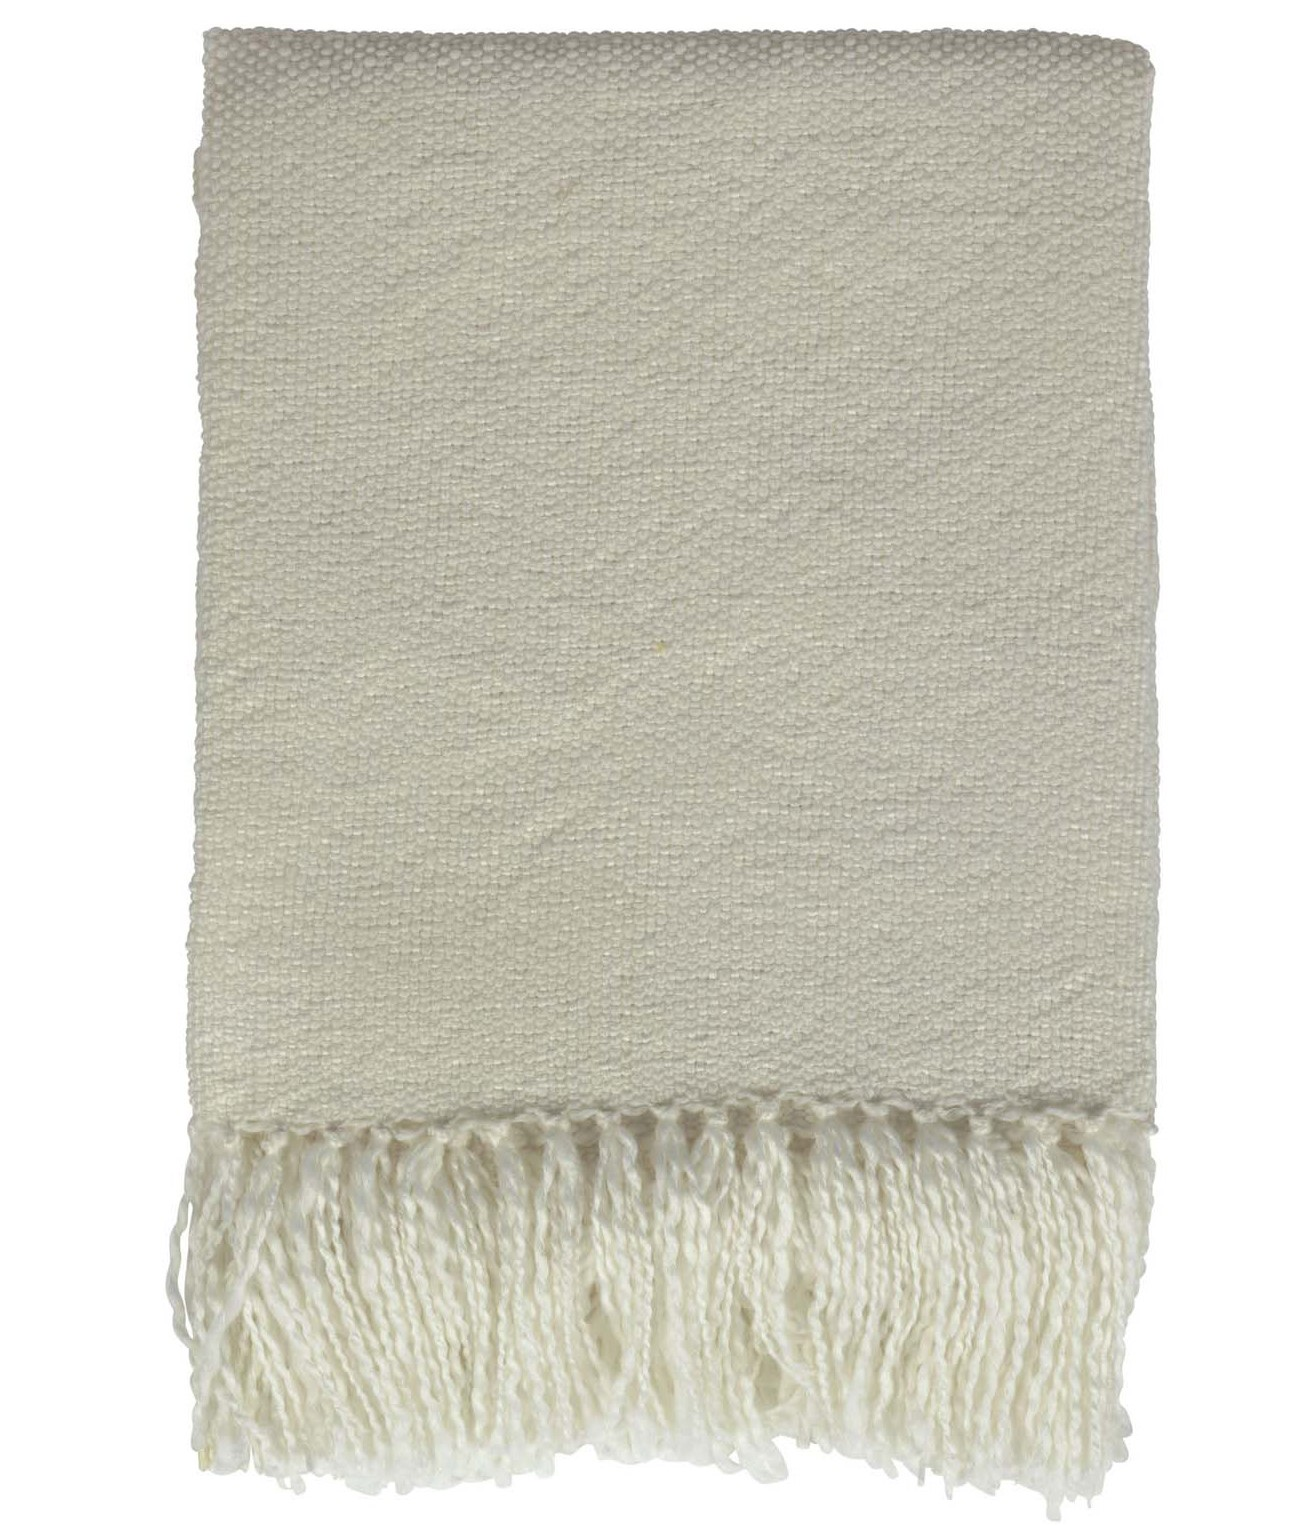 MINDY - Plaid ivoor 130x180 cm